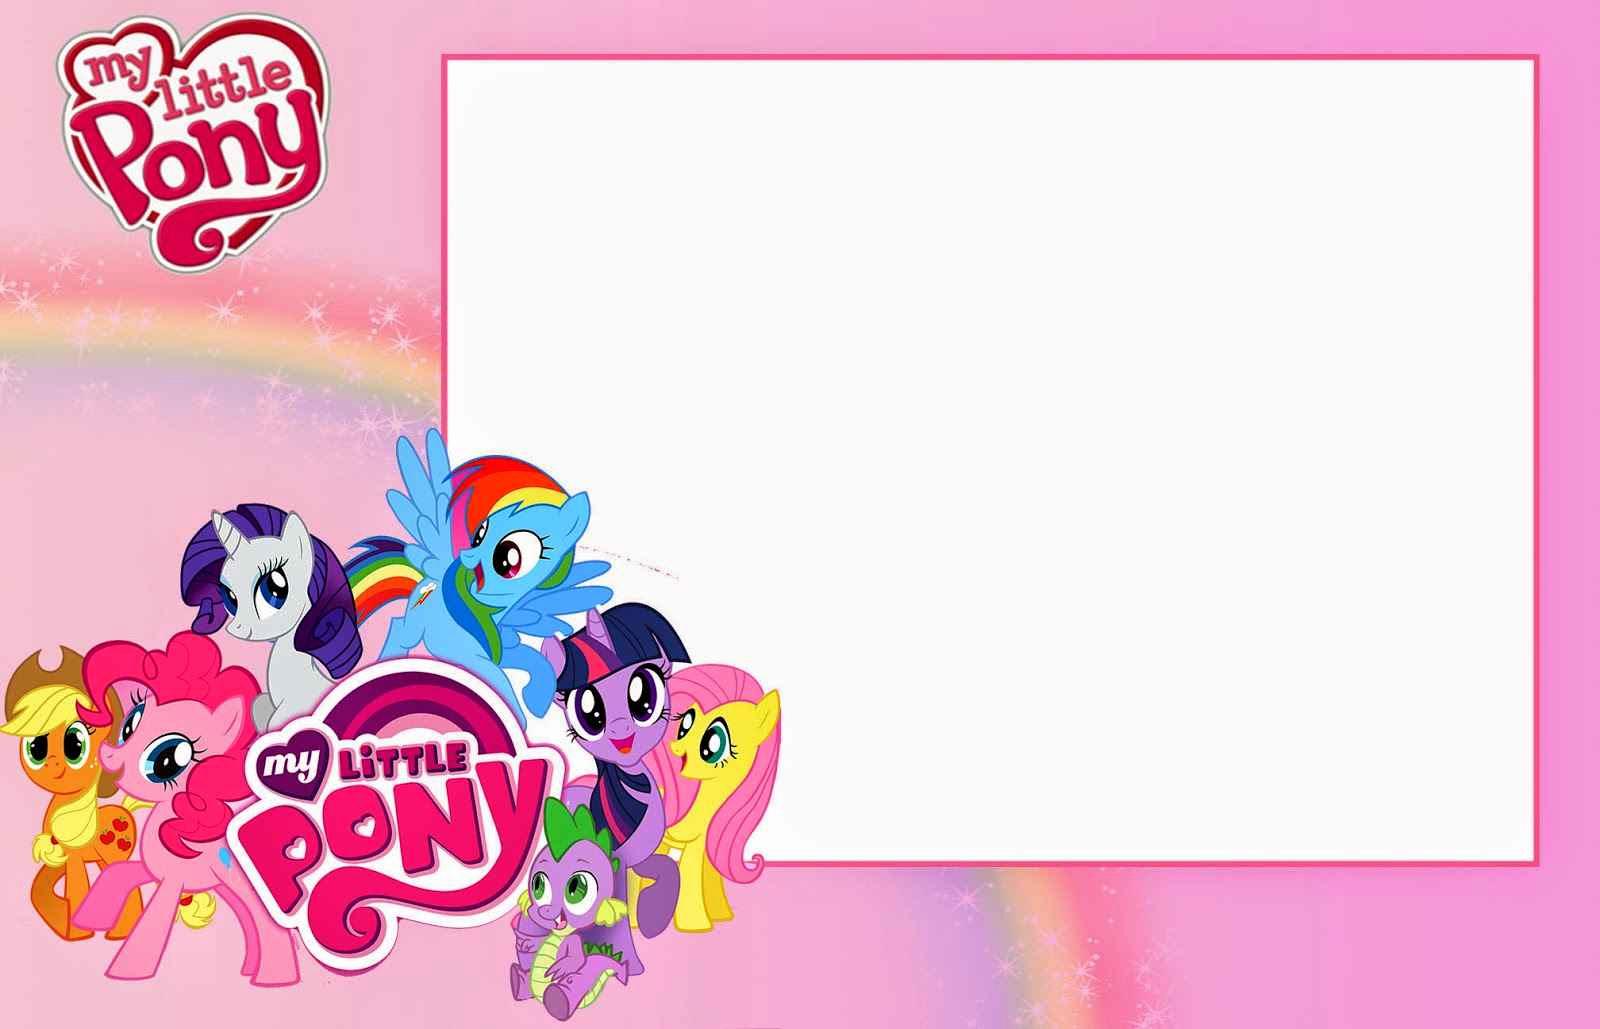 My Little Pony Invitation Ideas Luxury My Little Pony Birthday Invitations